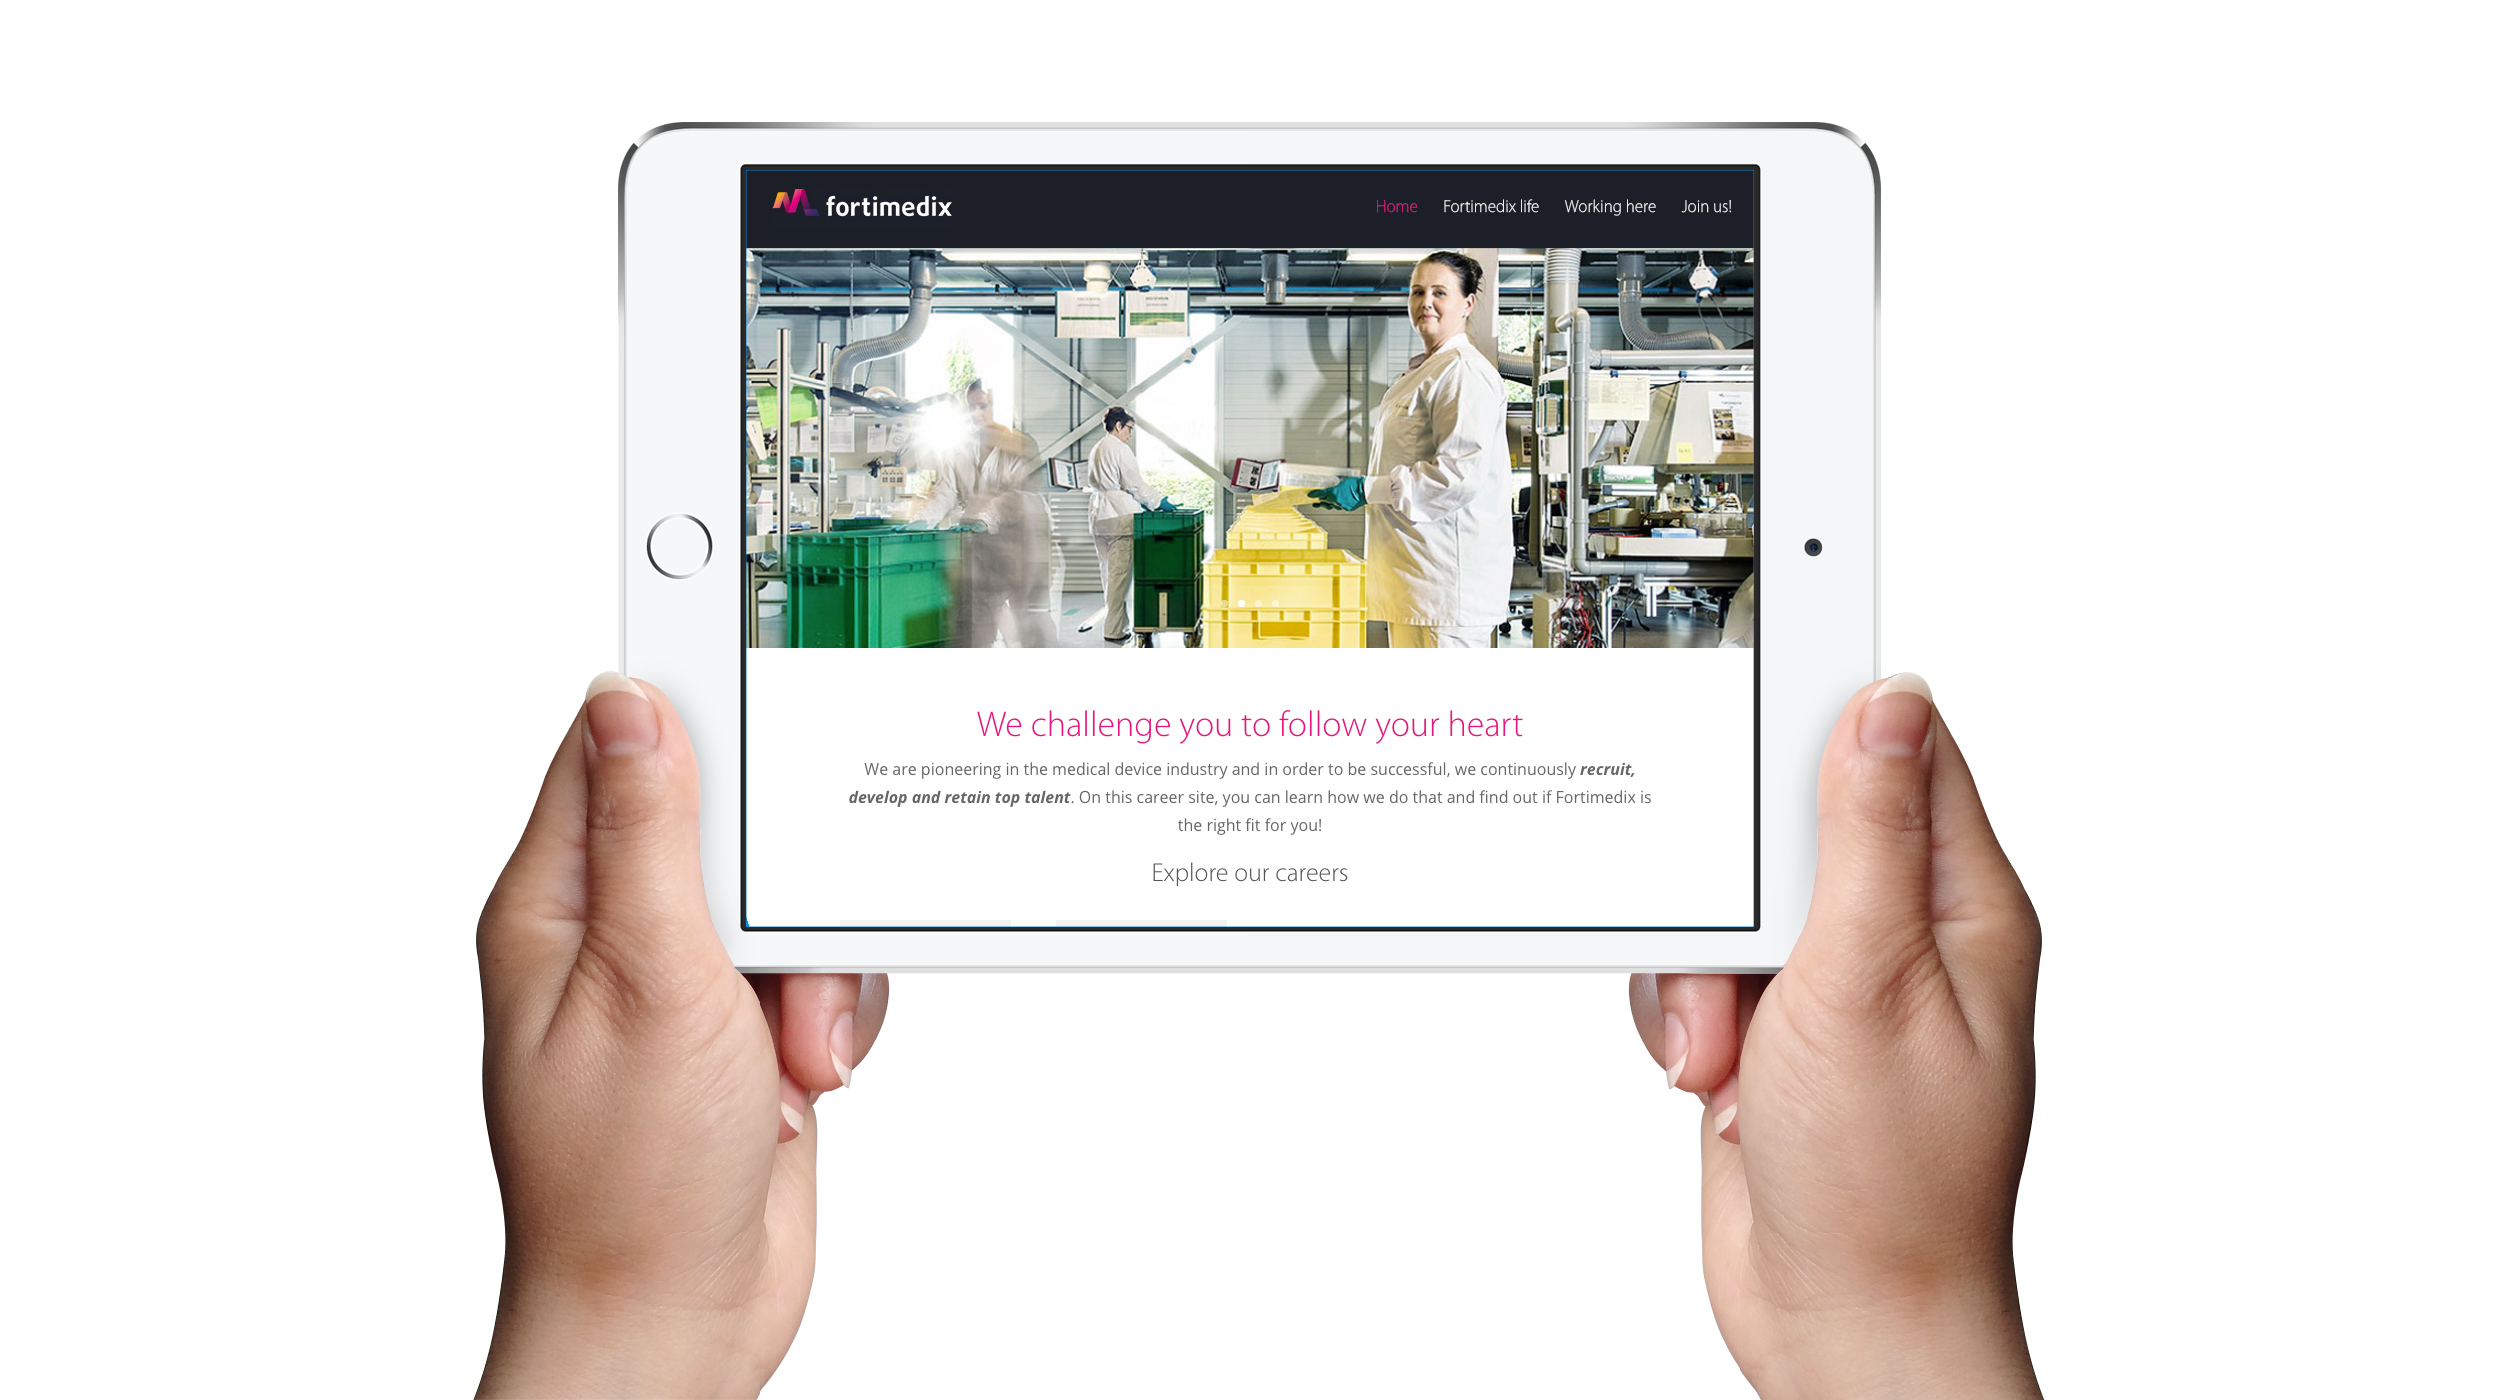 RS_Sites_iPad6